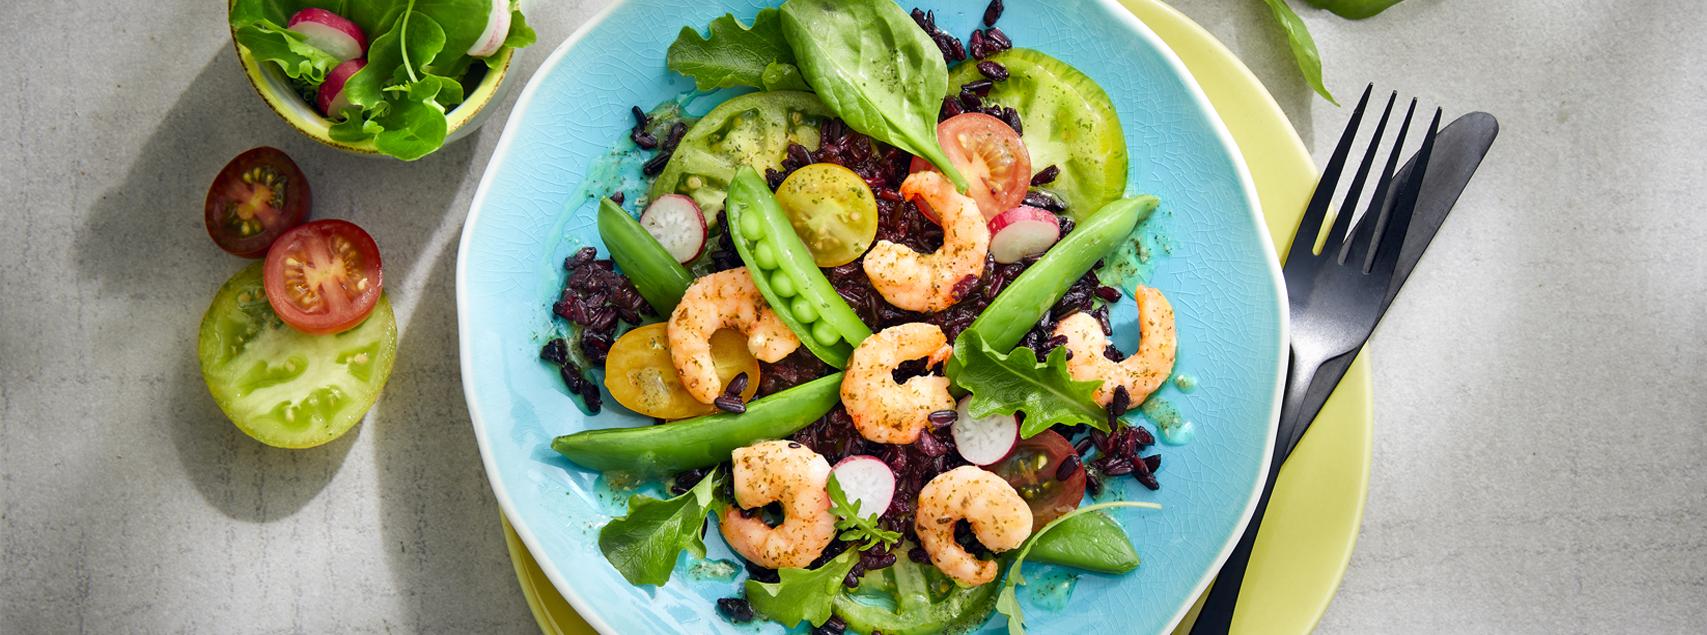 Salad of black rice and marinated prawns